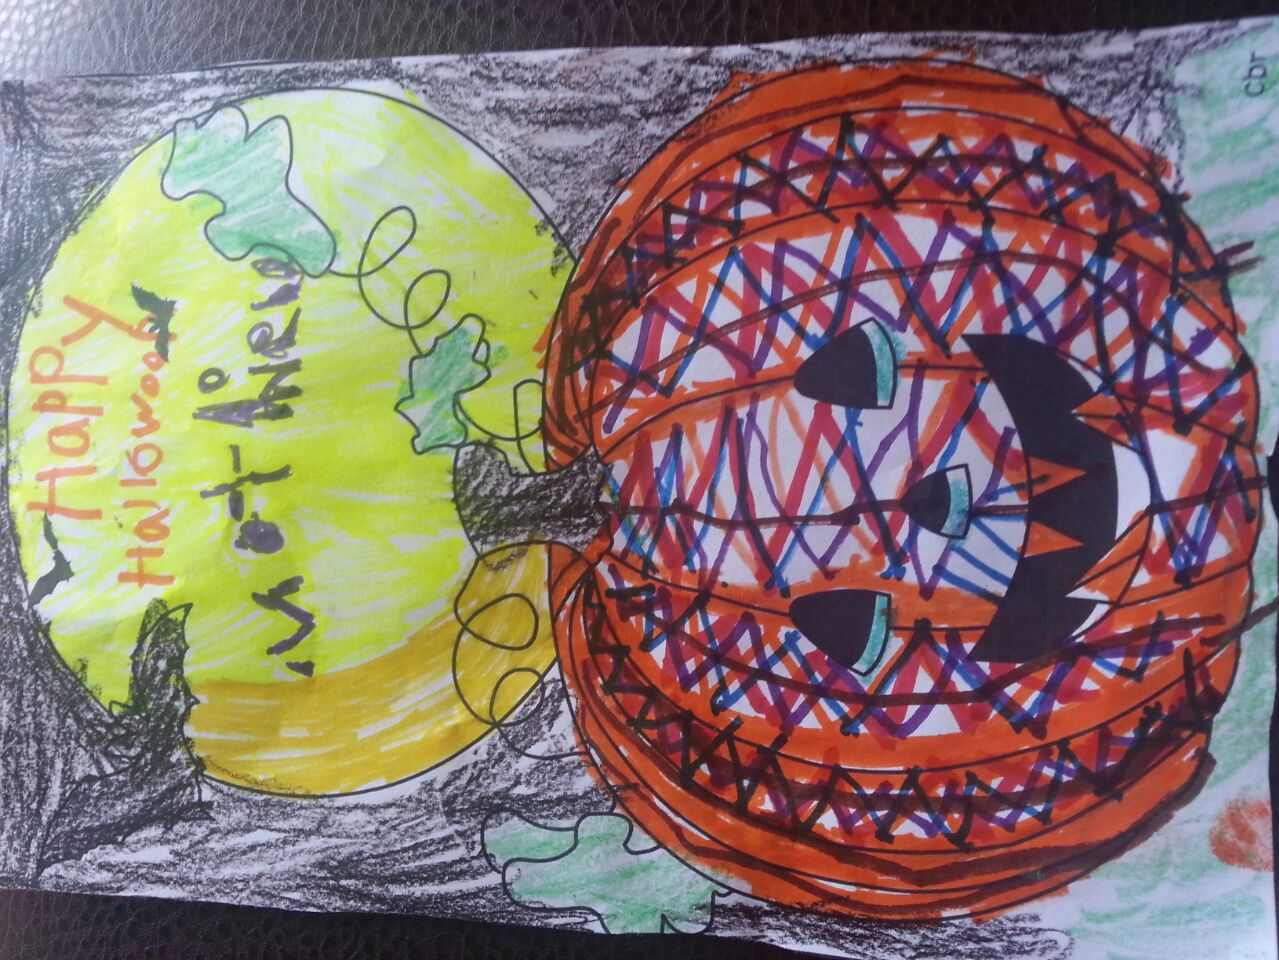 French stories - Les fêtes (Halloween, Noel, Thanksgiving, Saint-Valentin, Carnaval)